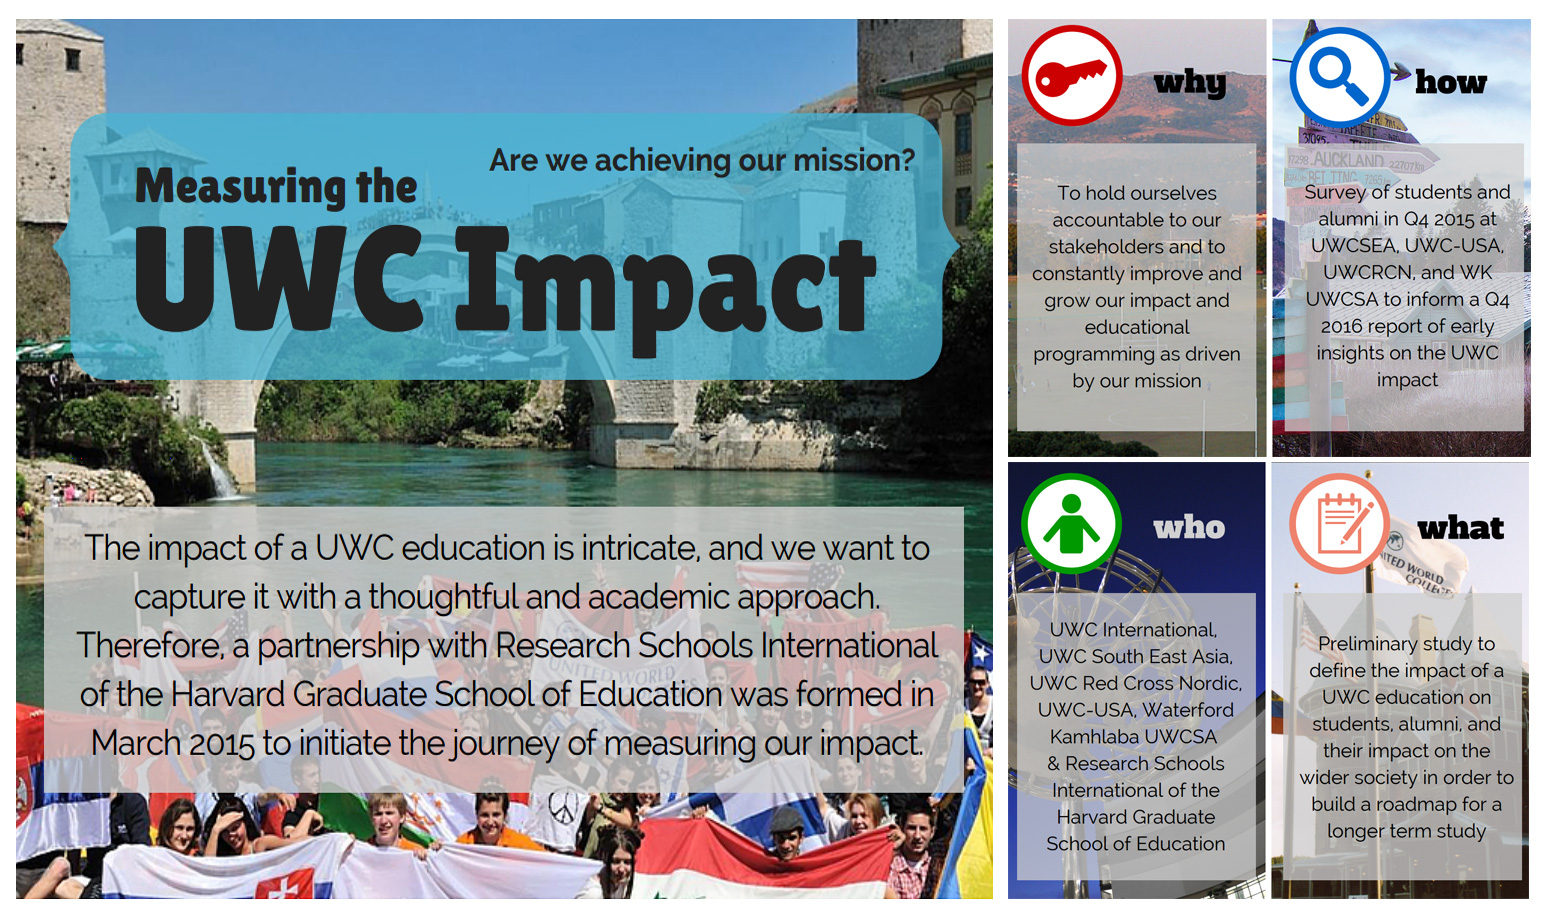 UWC Impact Poster